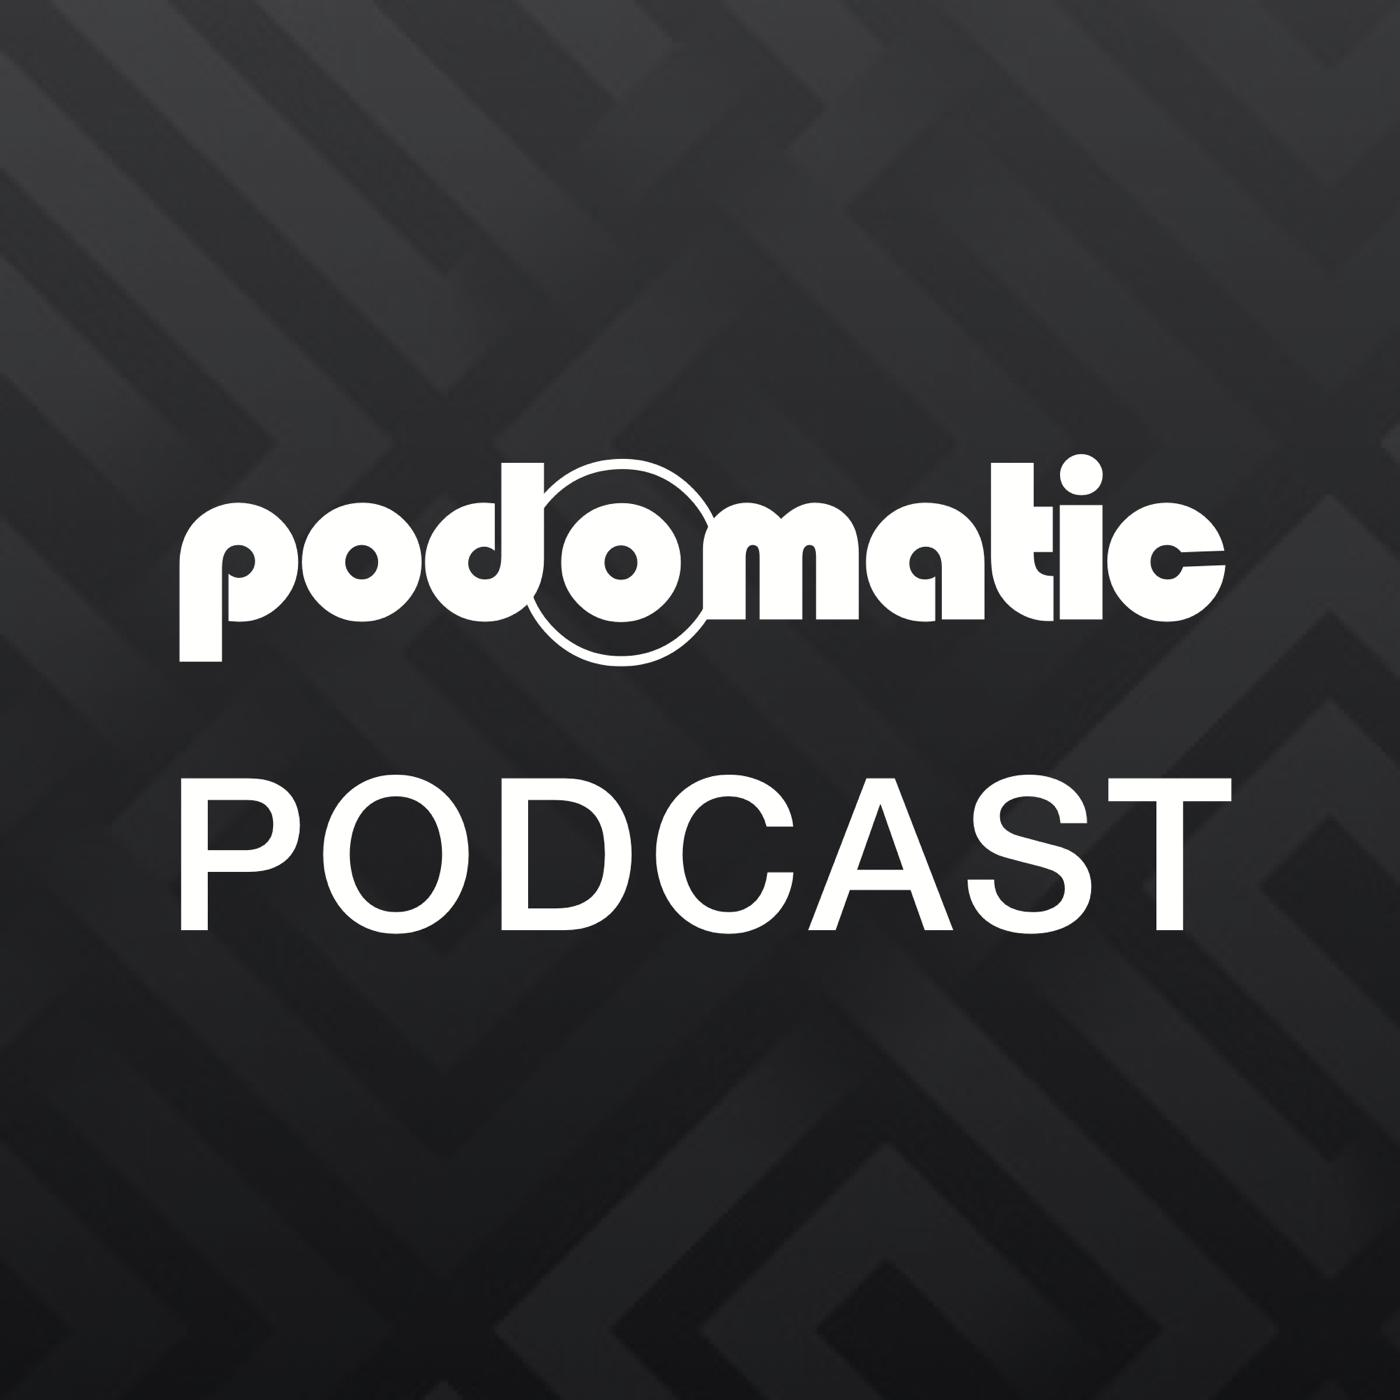 Southwest Desert Original Instrumental Music (podcast